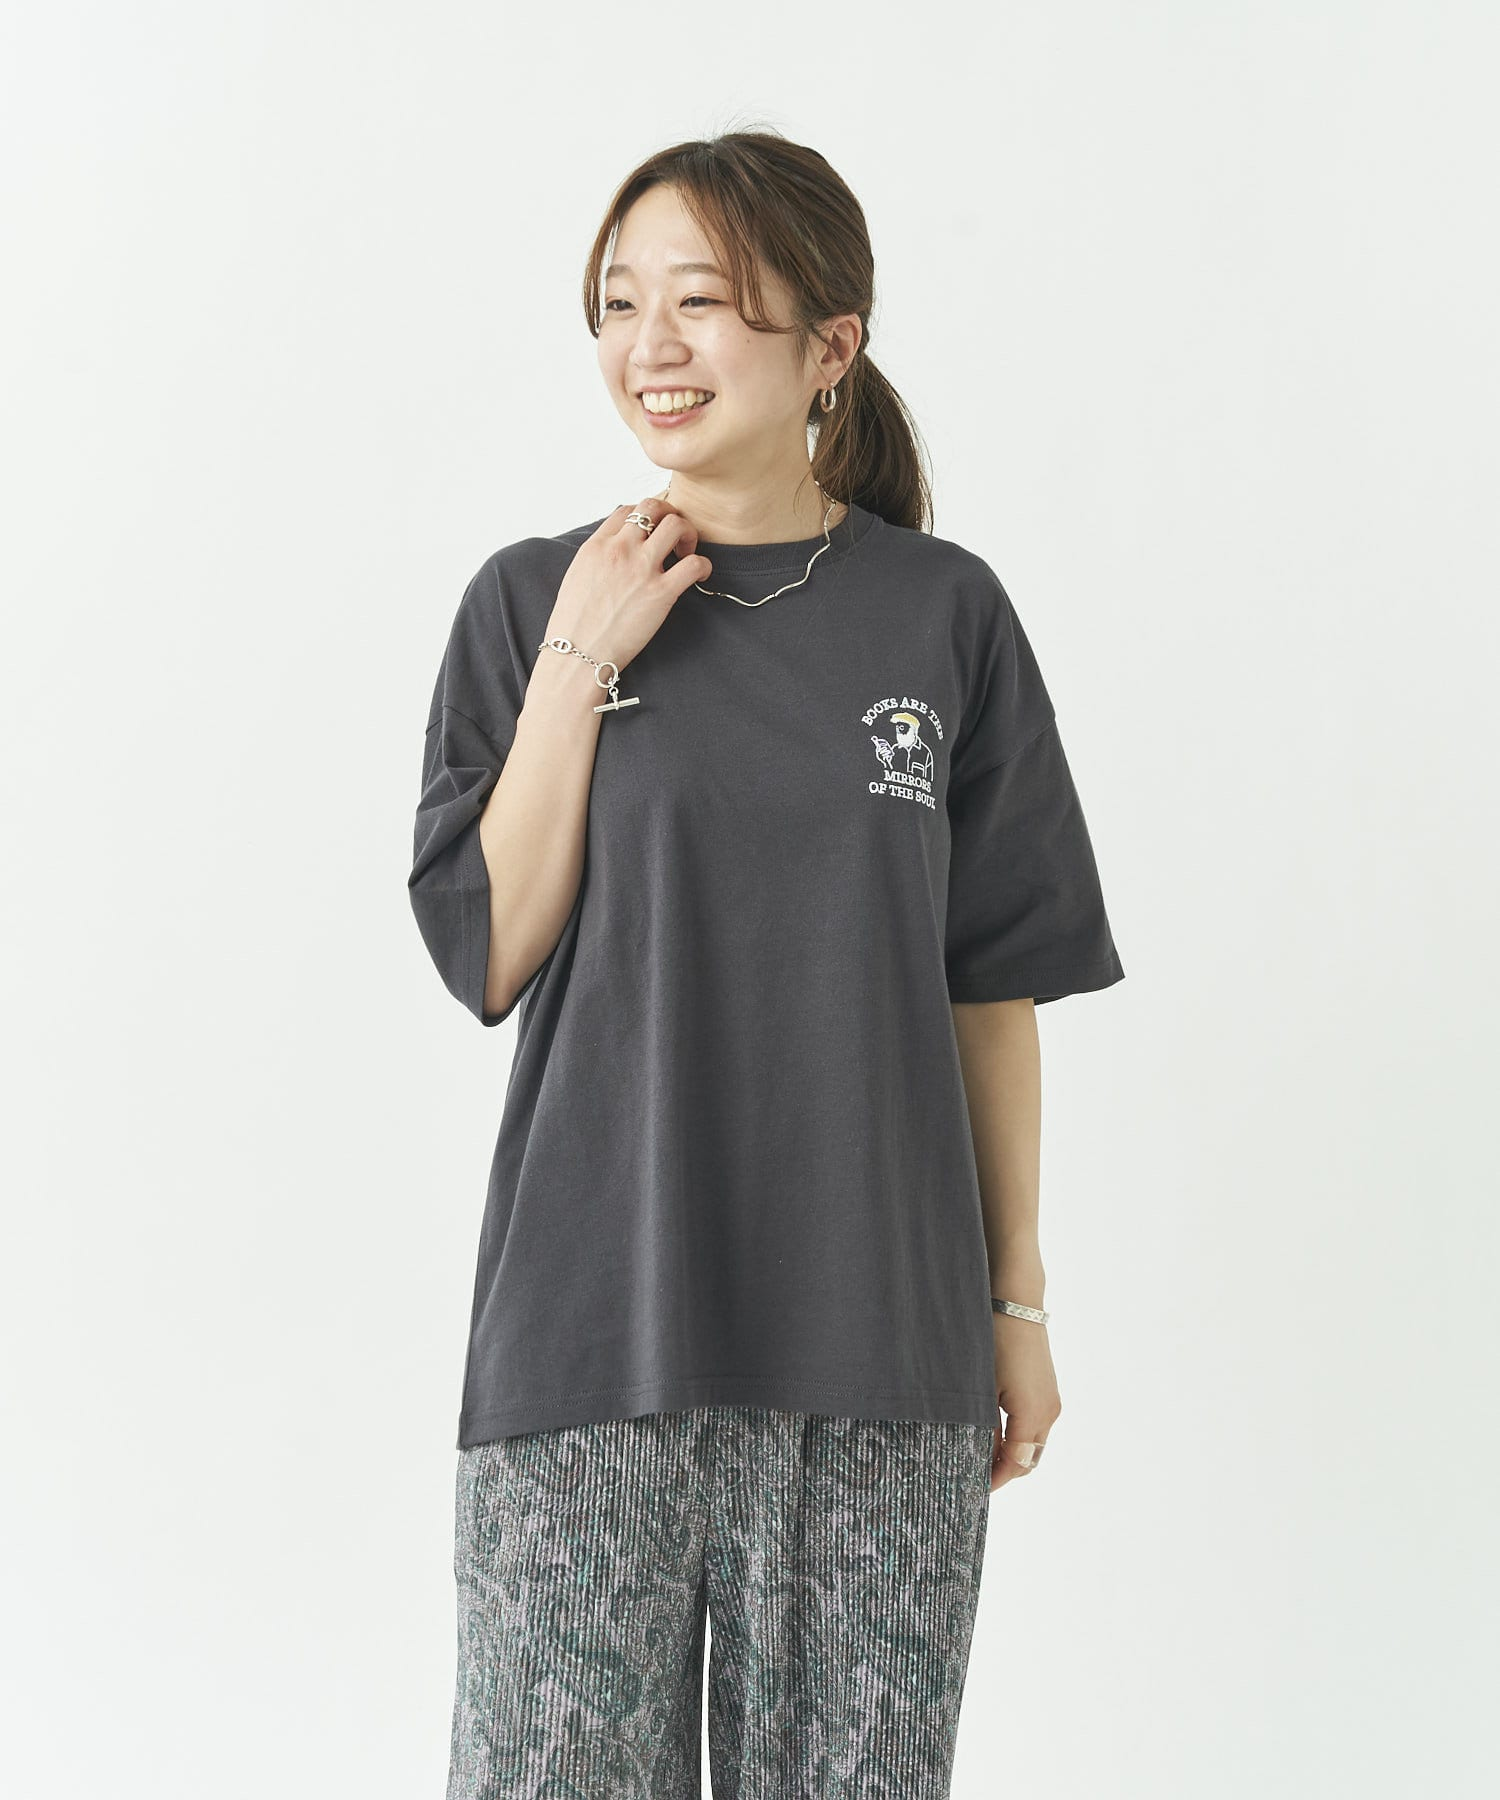 CPCM(シーピーシーエム) ヒゲサガラ刺繍T